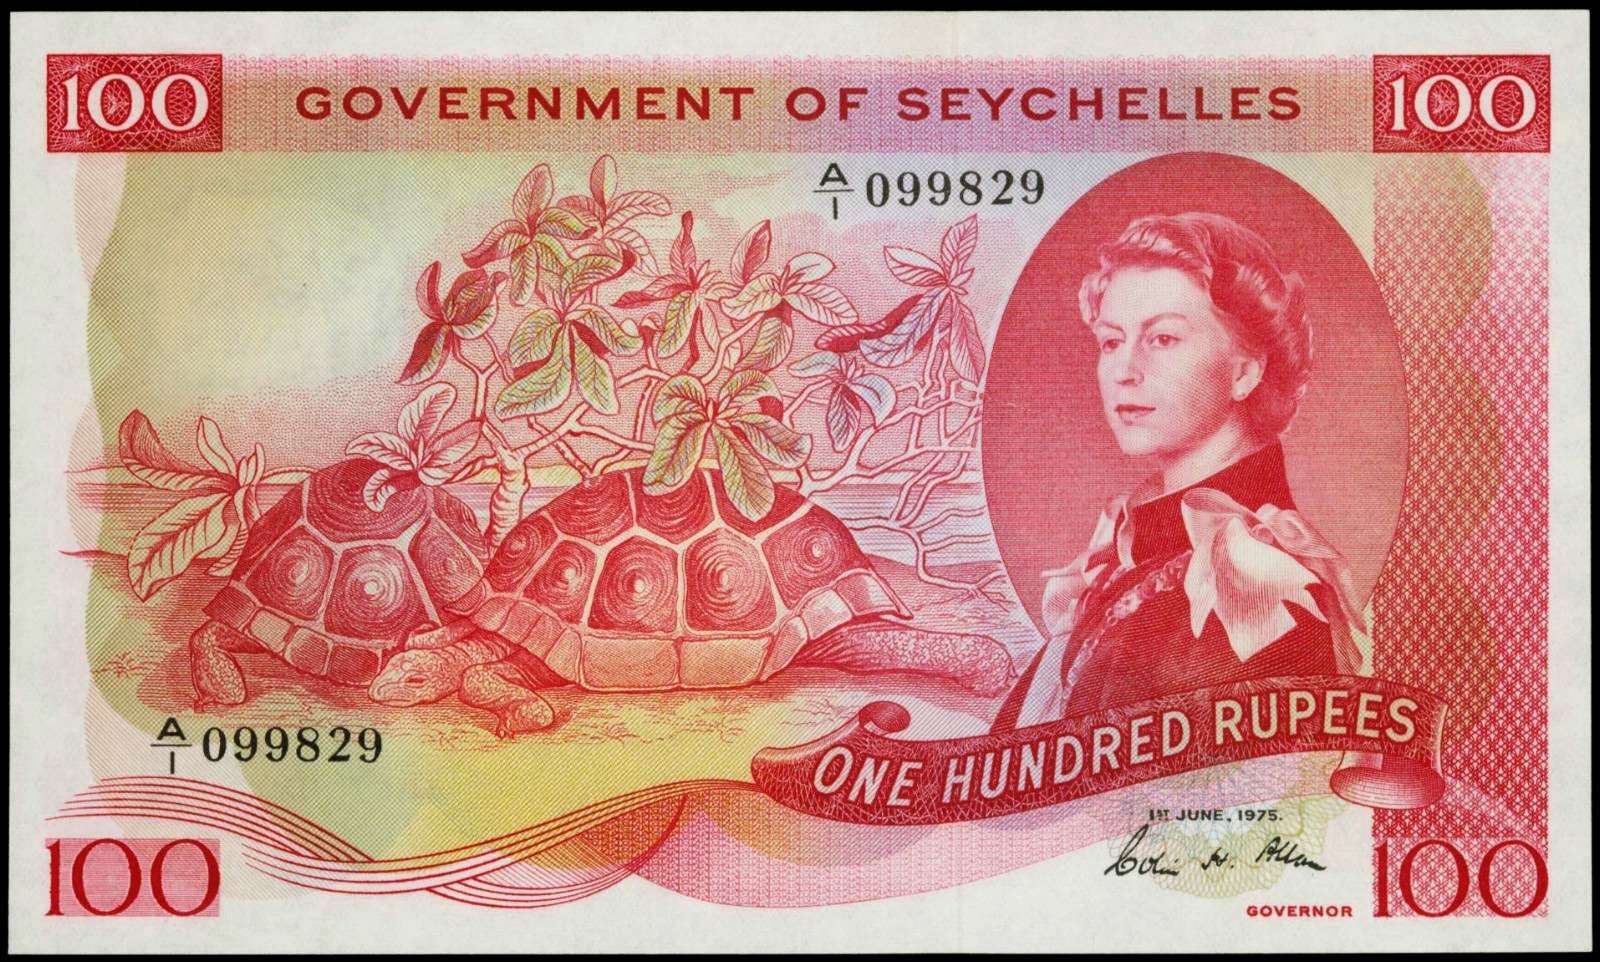 Seychelles banknotes 100 Rupees note 1975 Queen Elizabeth II